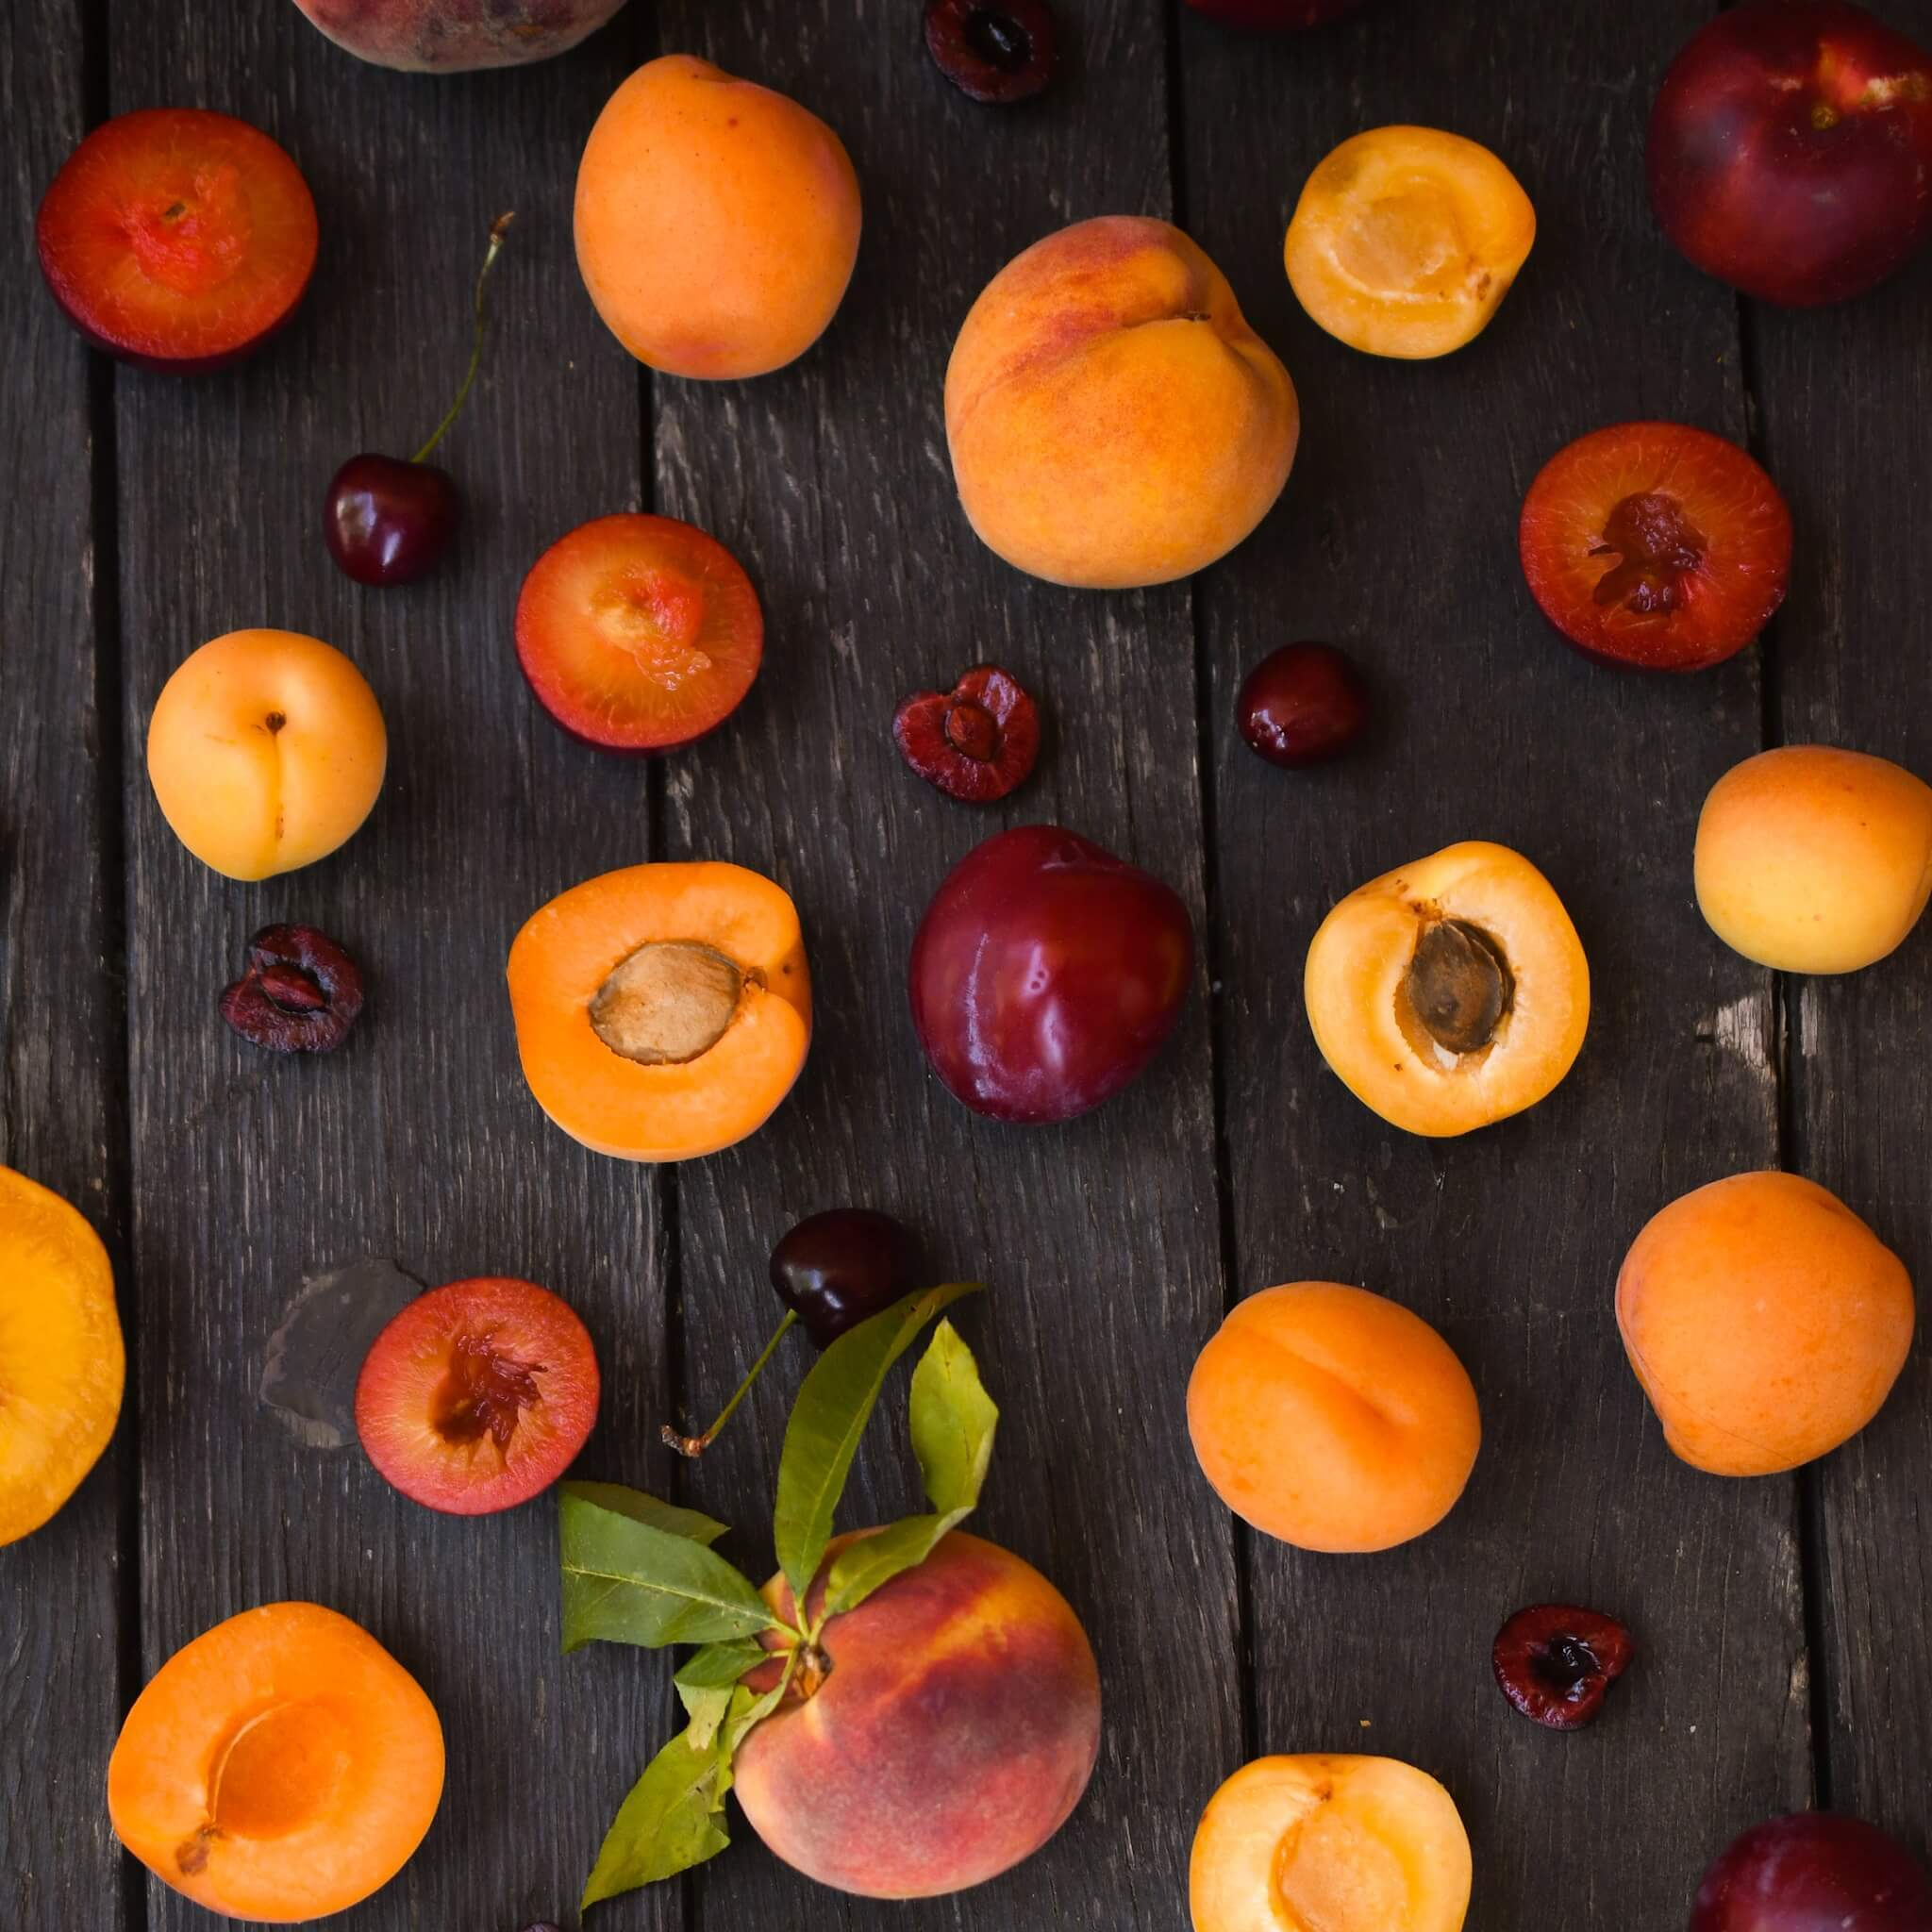 2021 Pick of the Week | Organic Fruit Club | 16 Shipments